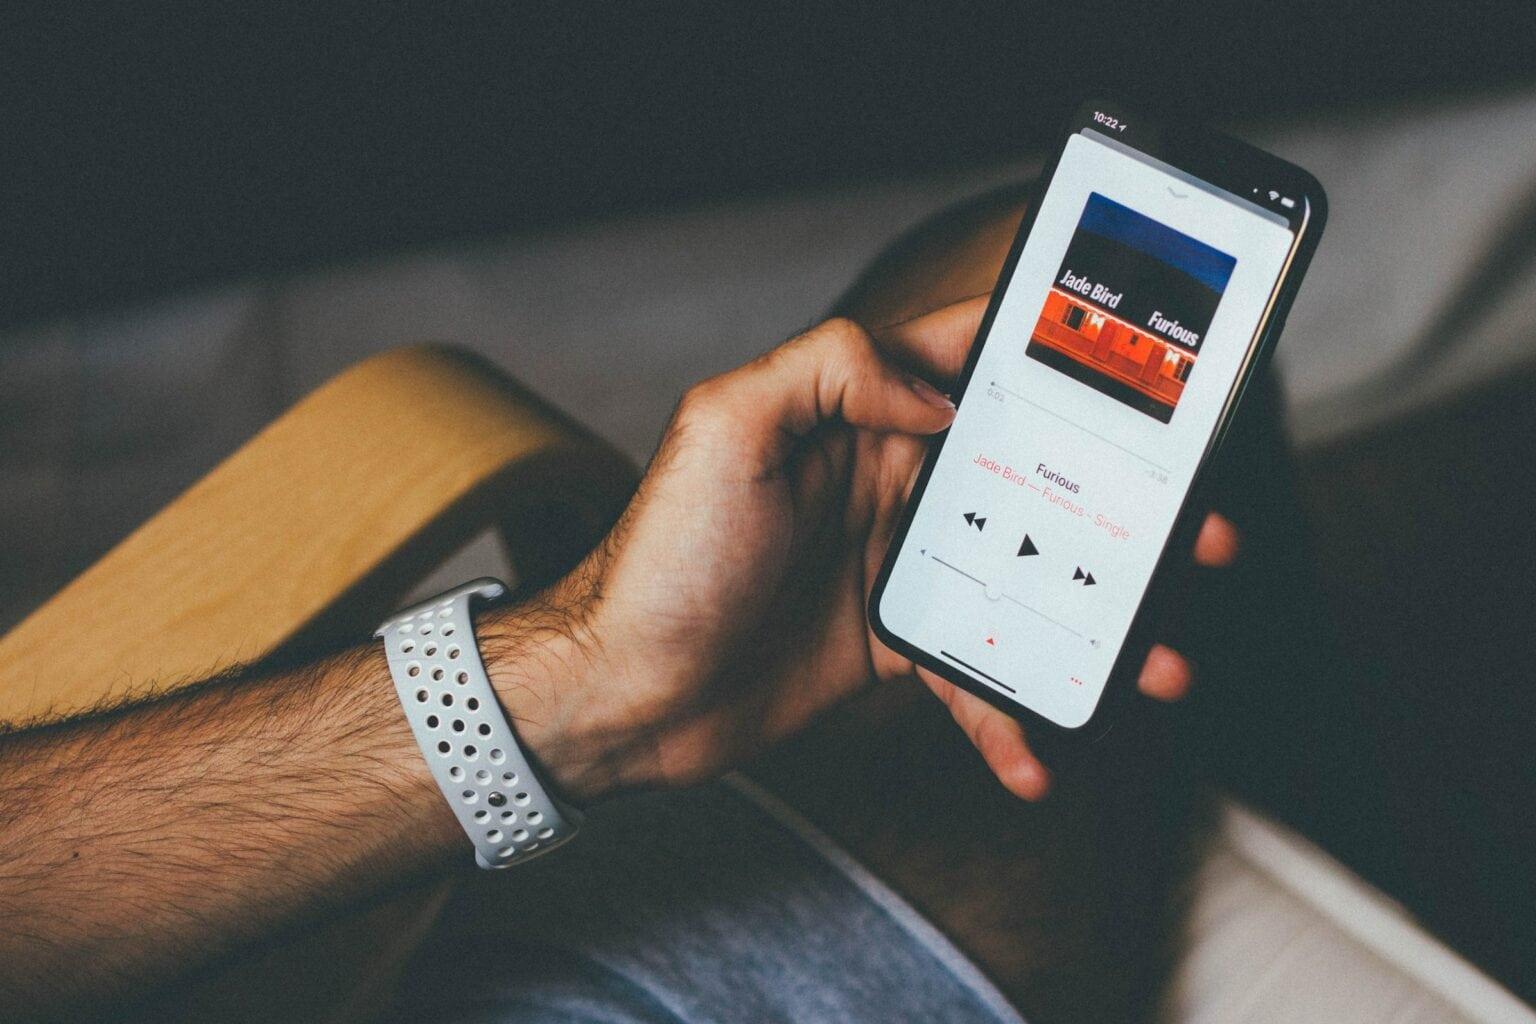 iPhone user on Apple Music